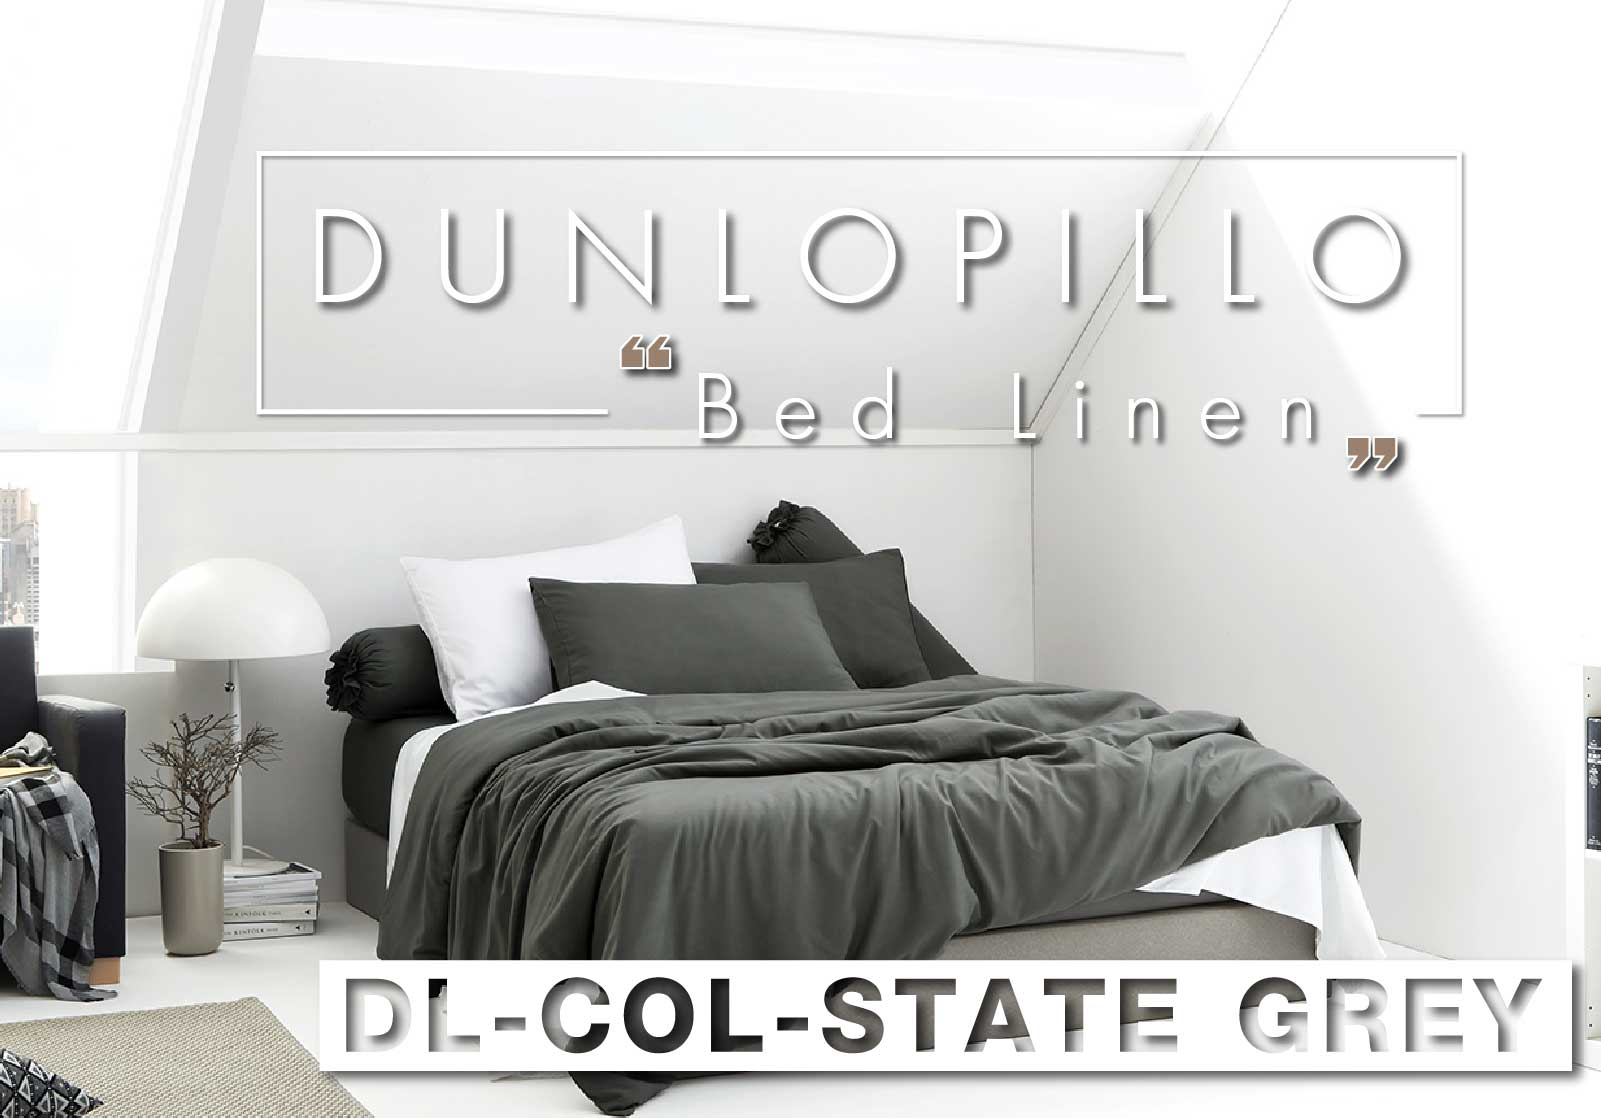 Dunlopillo รุ่น Solid ชุดผ้าปูที่นอน DL-CoL-SLATE-GREY